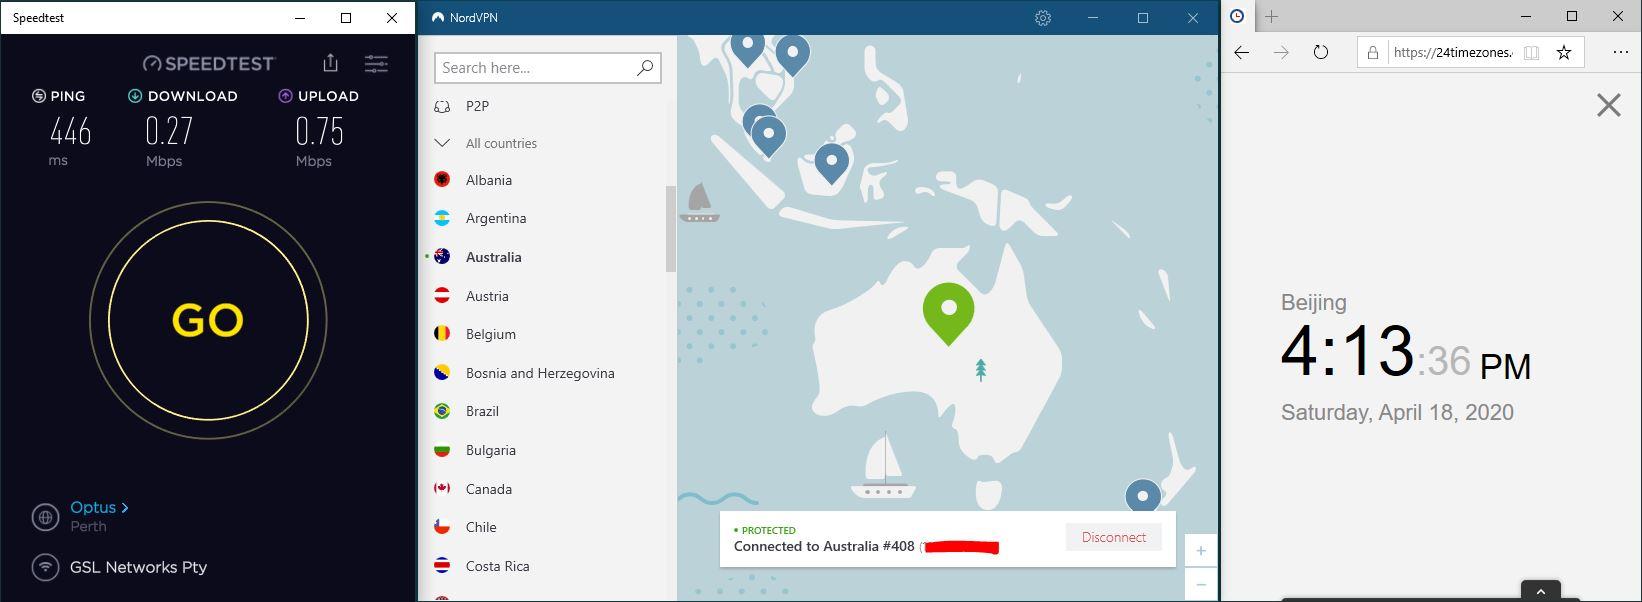 Windows10 NordVPN 混淆协议关闭 Australia #408 中国VPN 翻墙 科学上网 SpeedTest测速-20200418